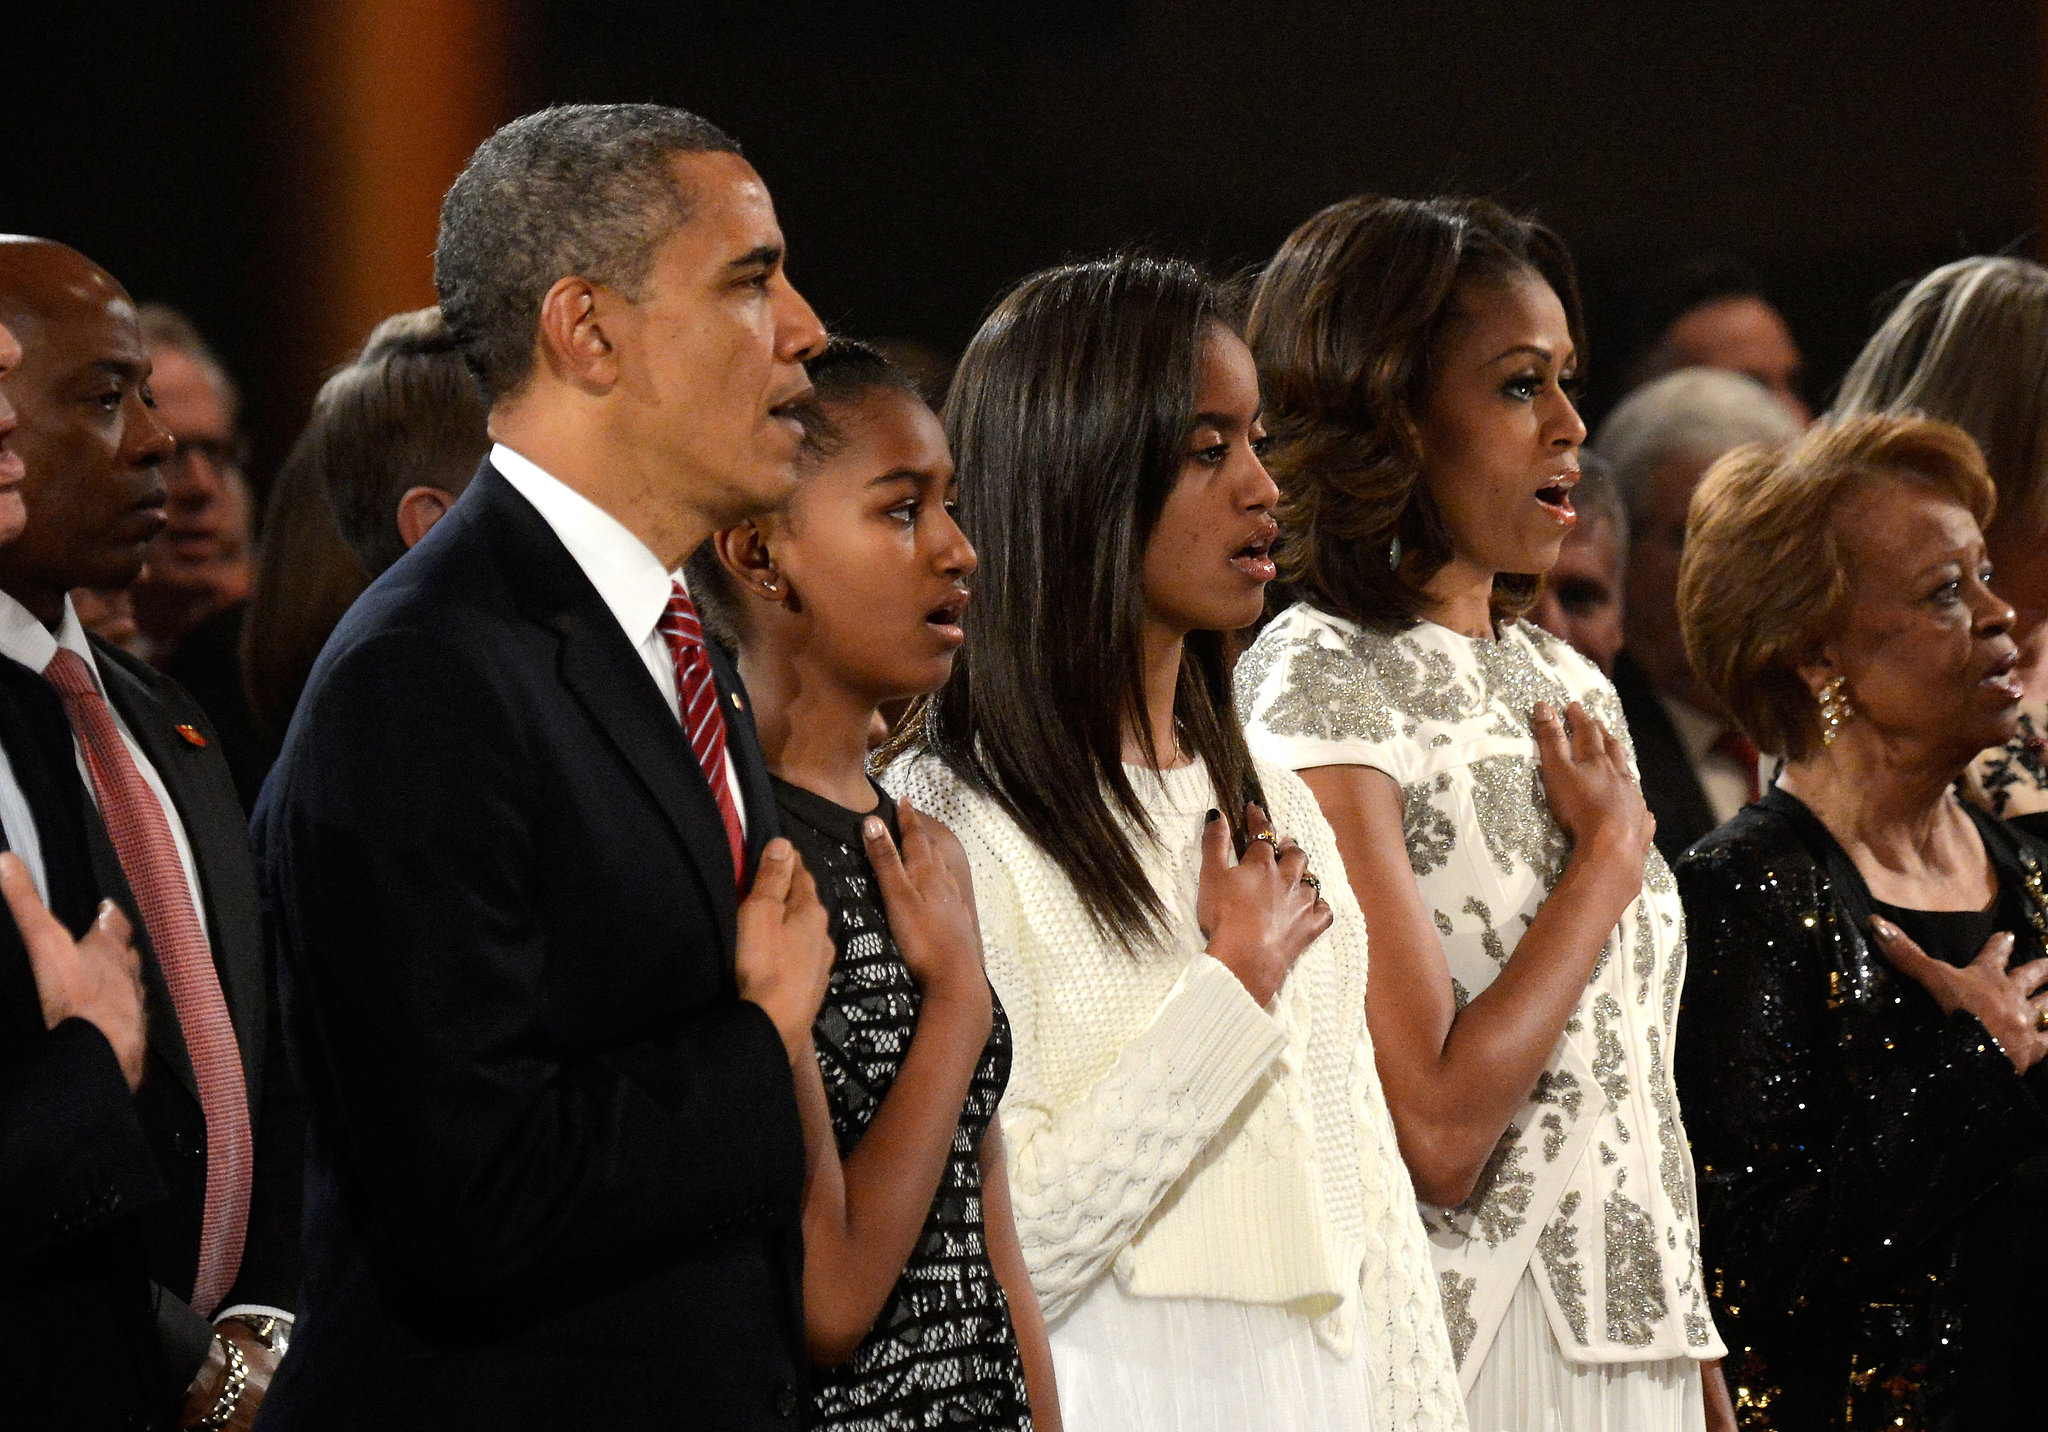 The Obamas sang together.